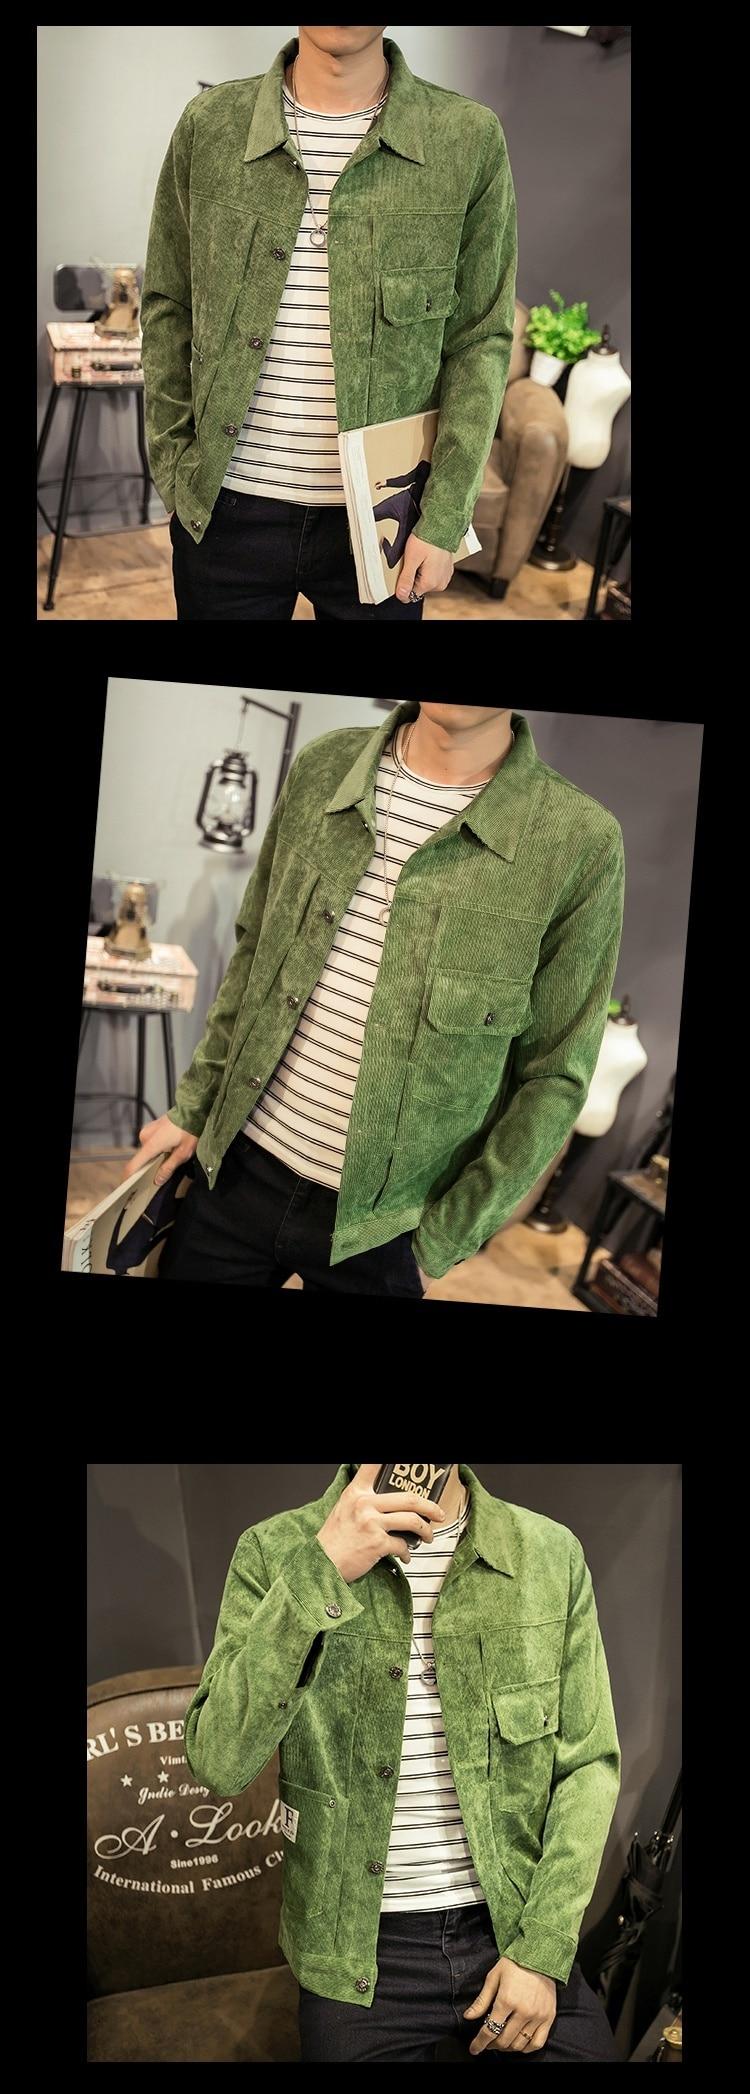 H4efac23af77247e2a689445406ee12876 Zongke Japan Style Corduroy Jacket Men Hip Hop Streetwear Men Jacket Coat Windbreaker Clothes Bomber Jacket Men 5XL 2019 New